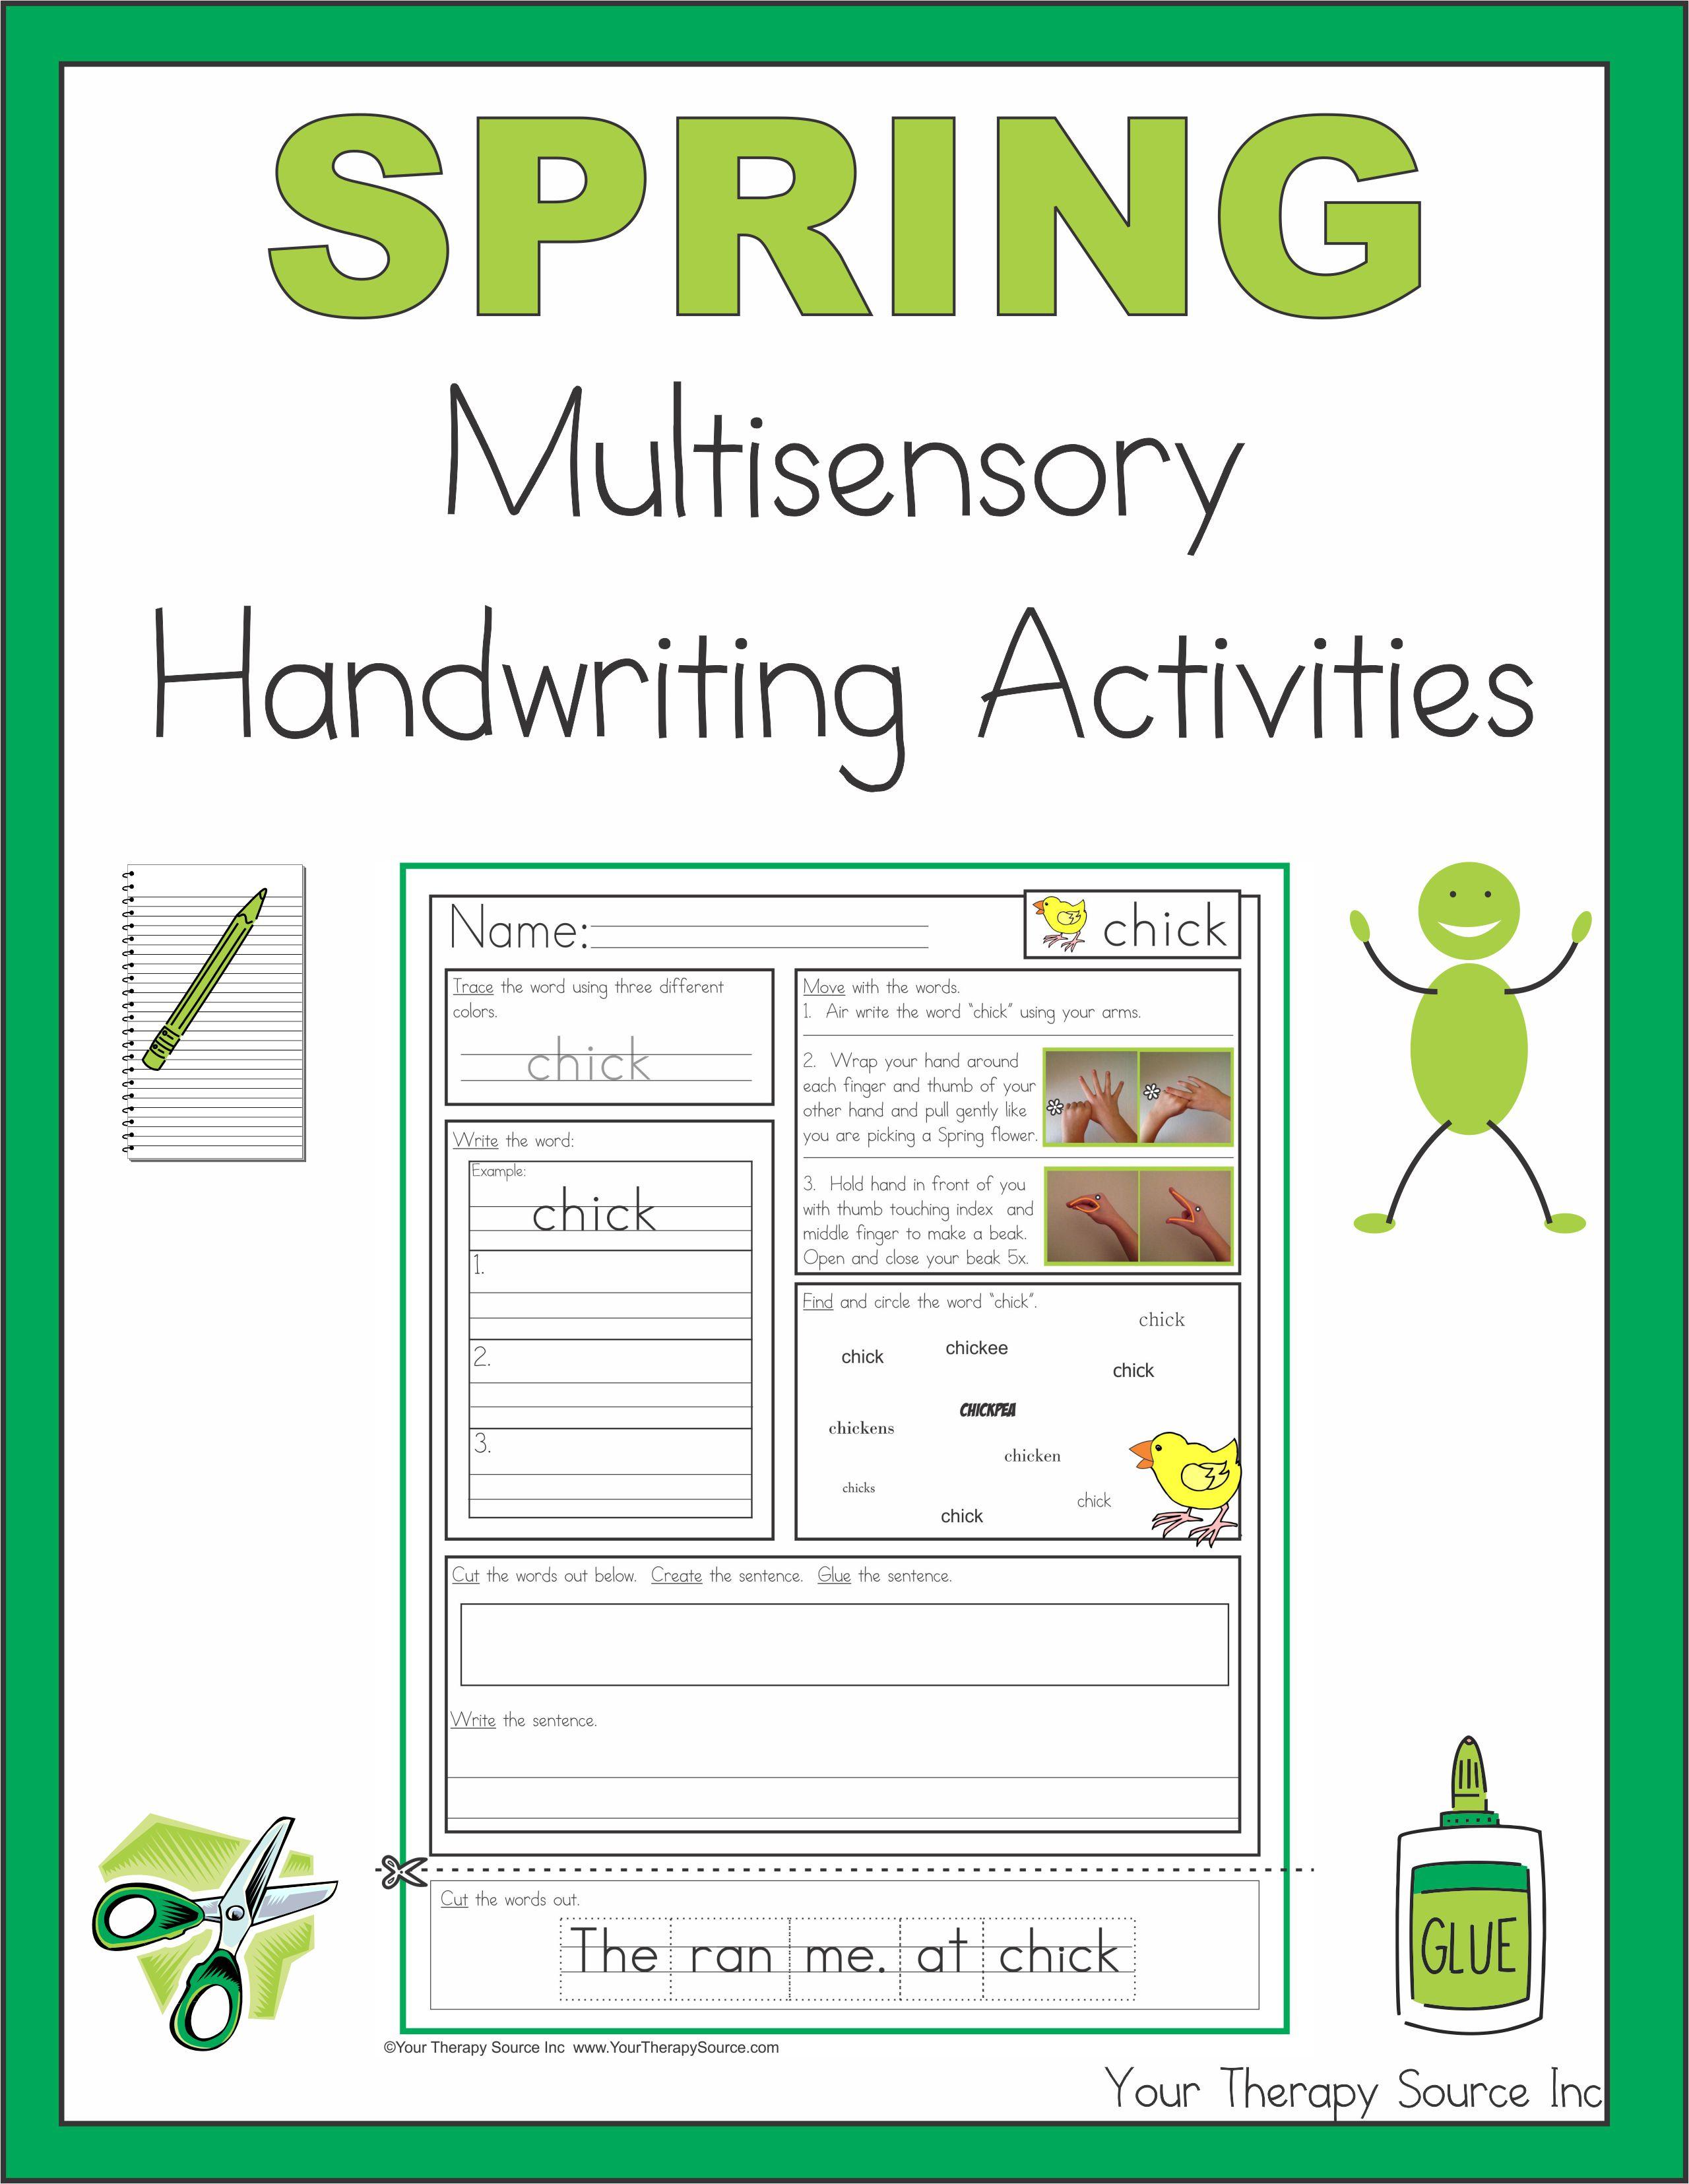 Spring Multisensory Handwriting Activities